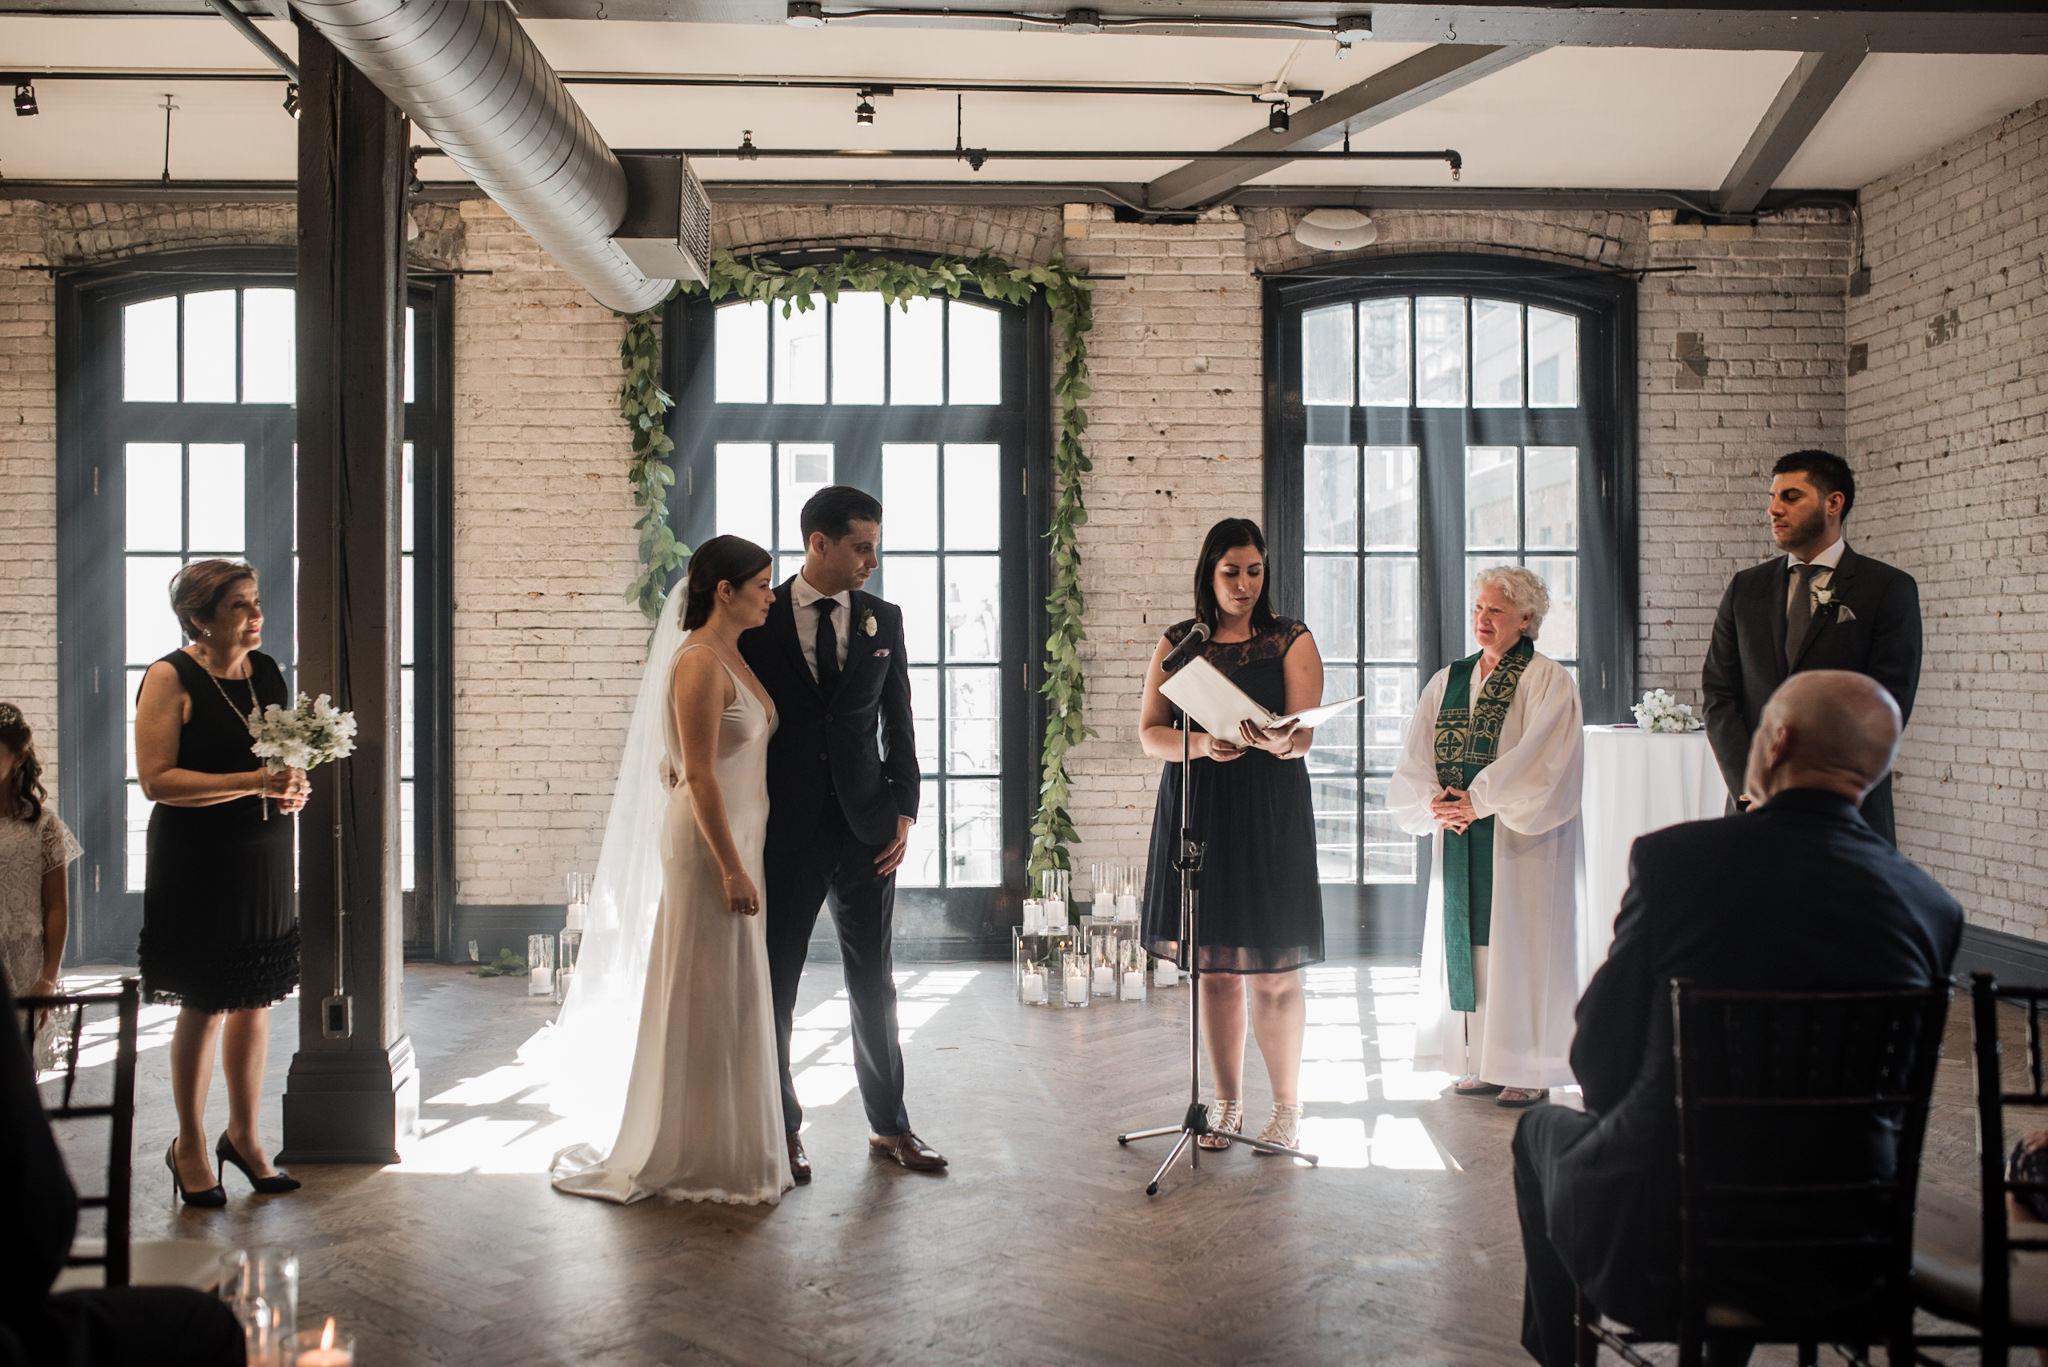 108-wedding-ceremony-storys-building-toronto-photographer-documentary.jpg